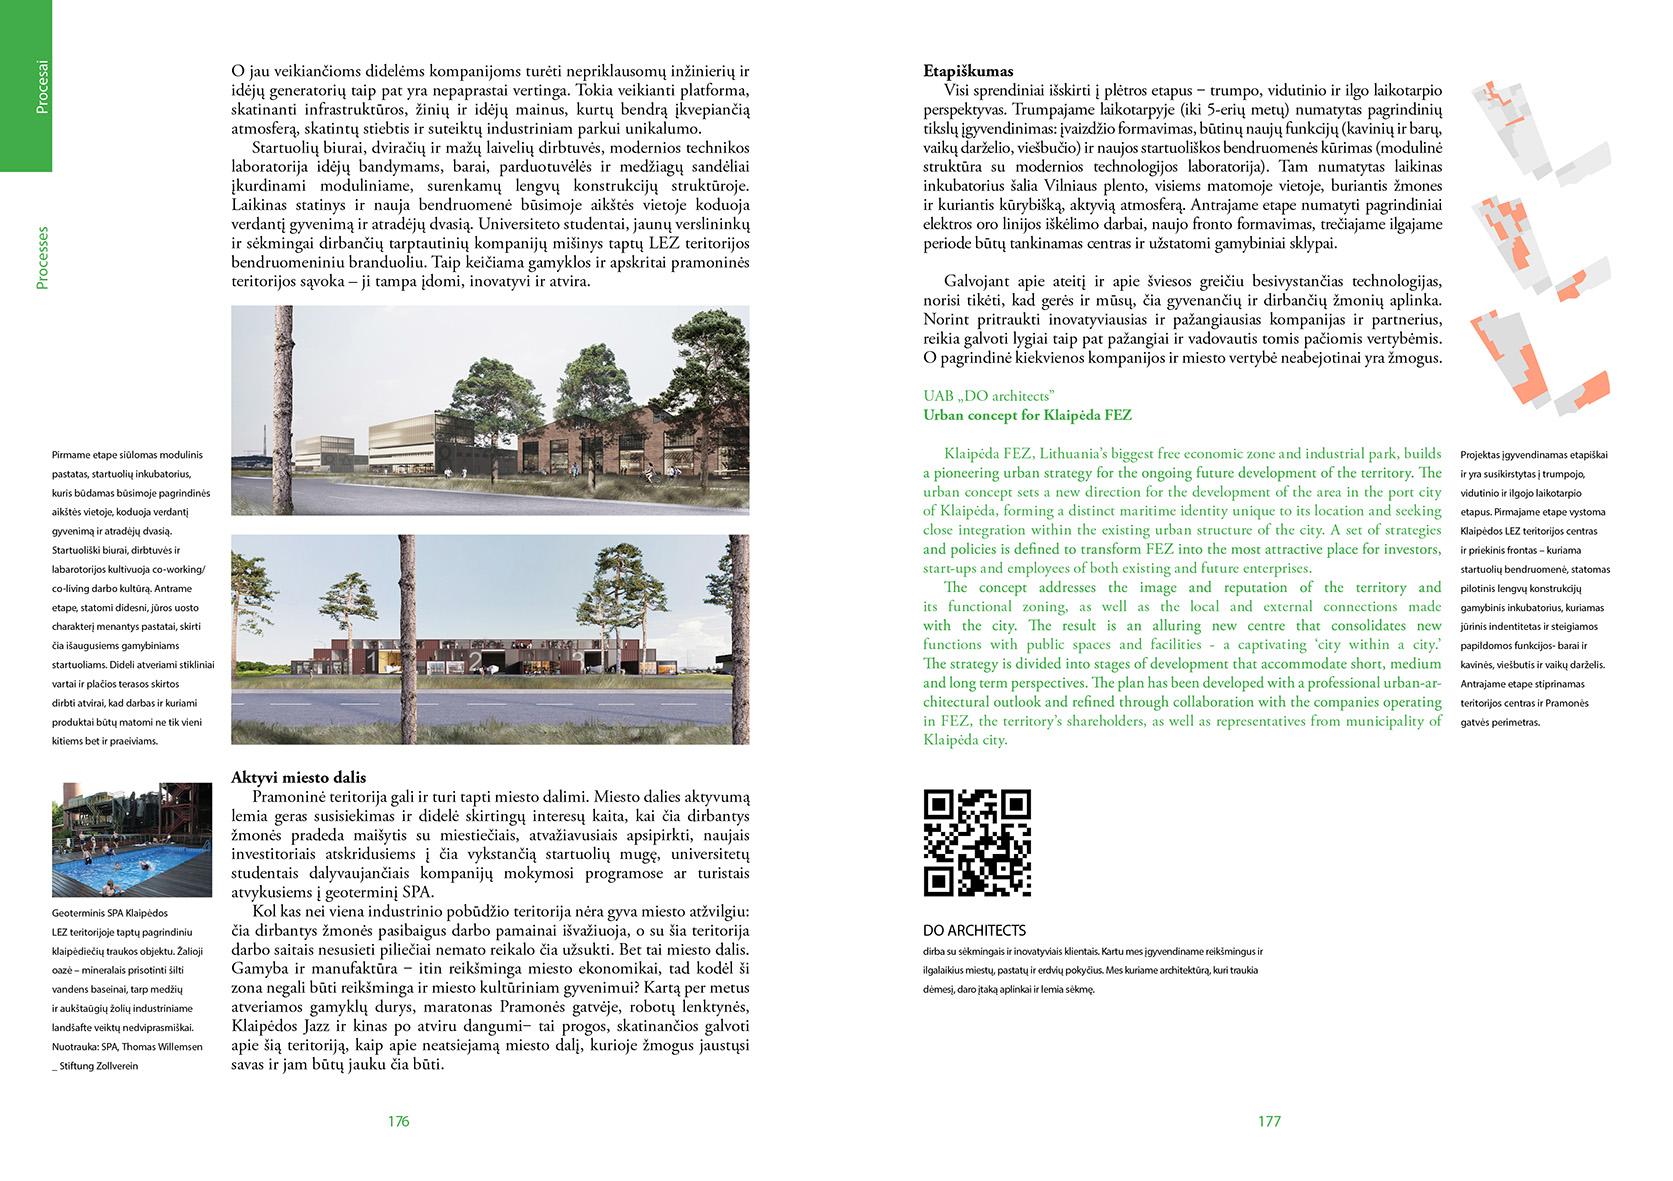 DO architects_Klaipeda Architecture 2014_03.jpg